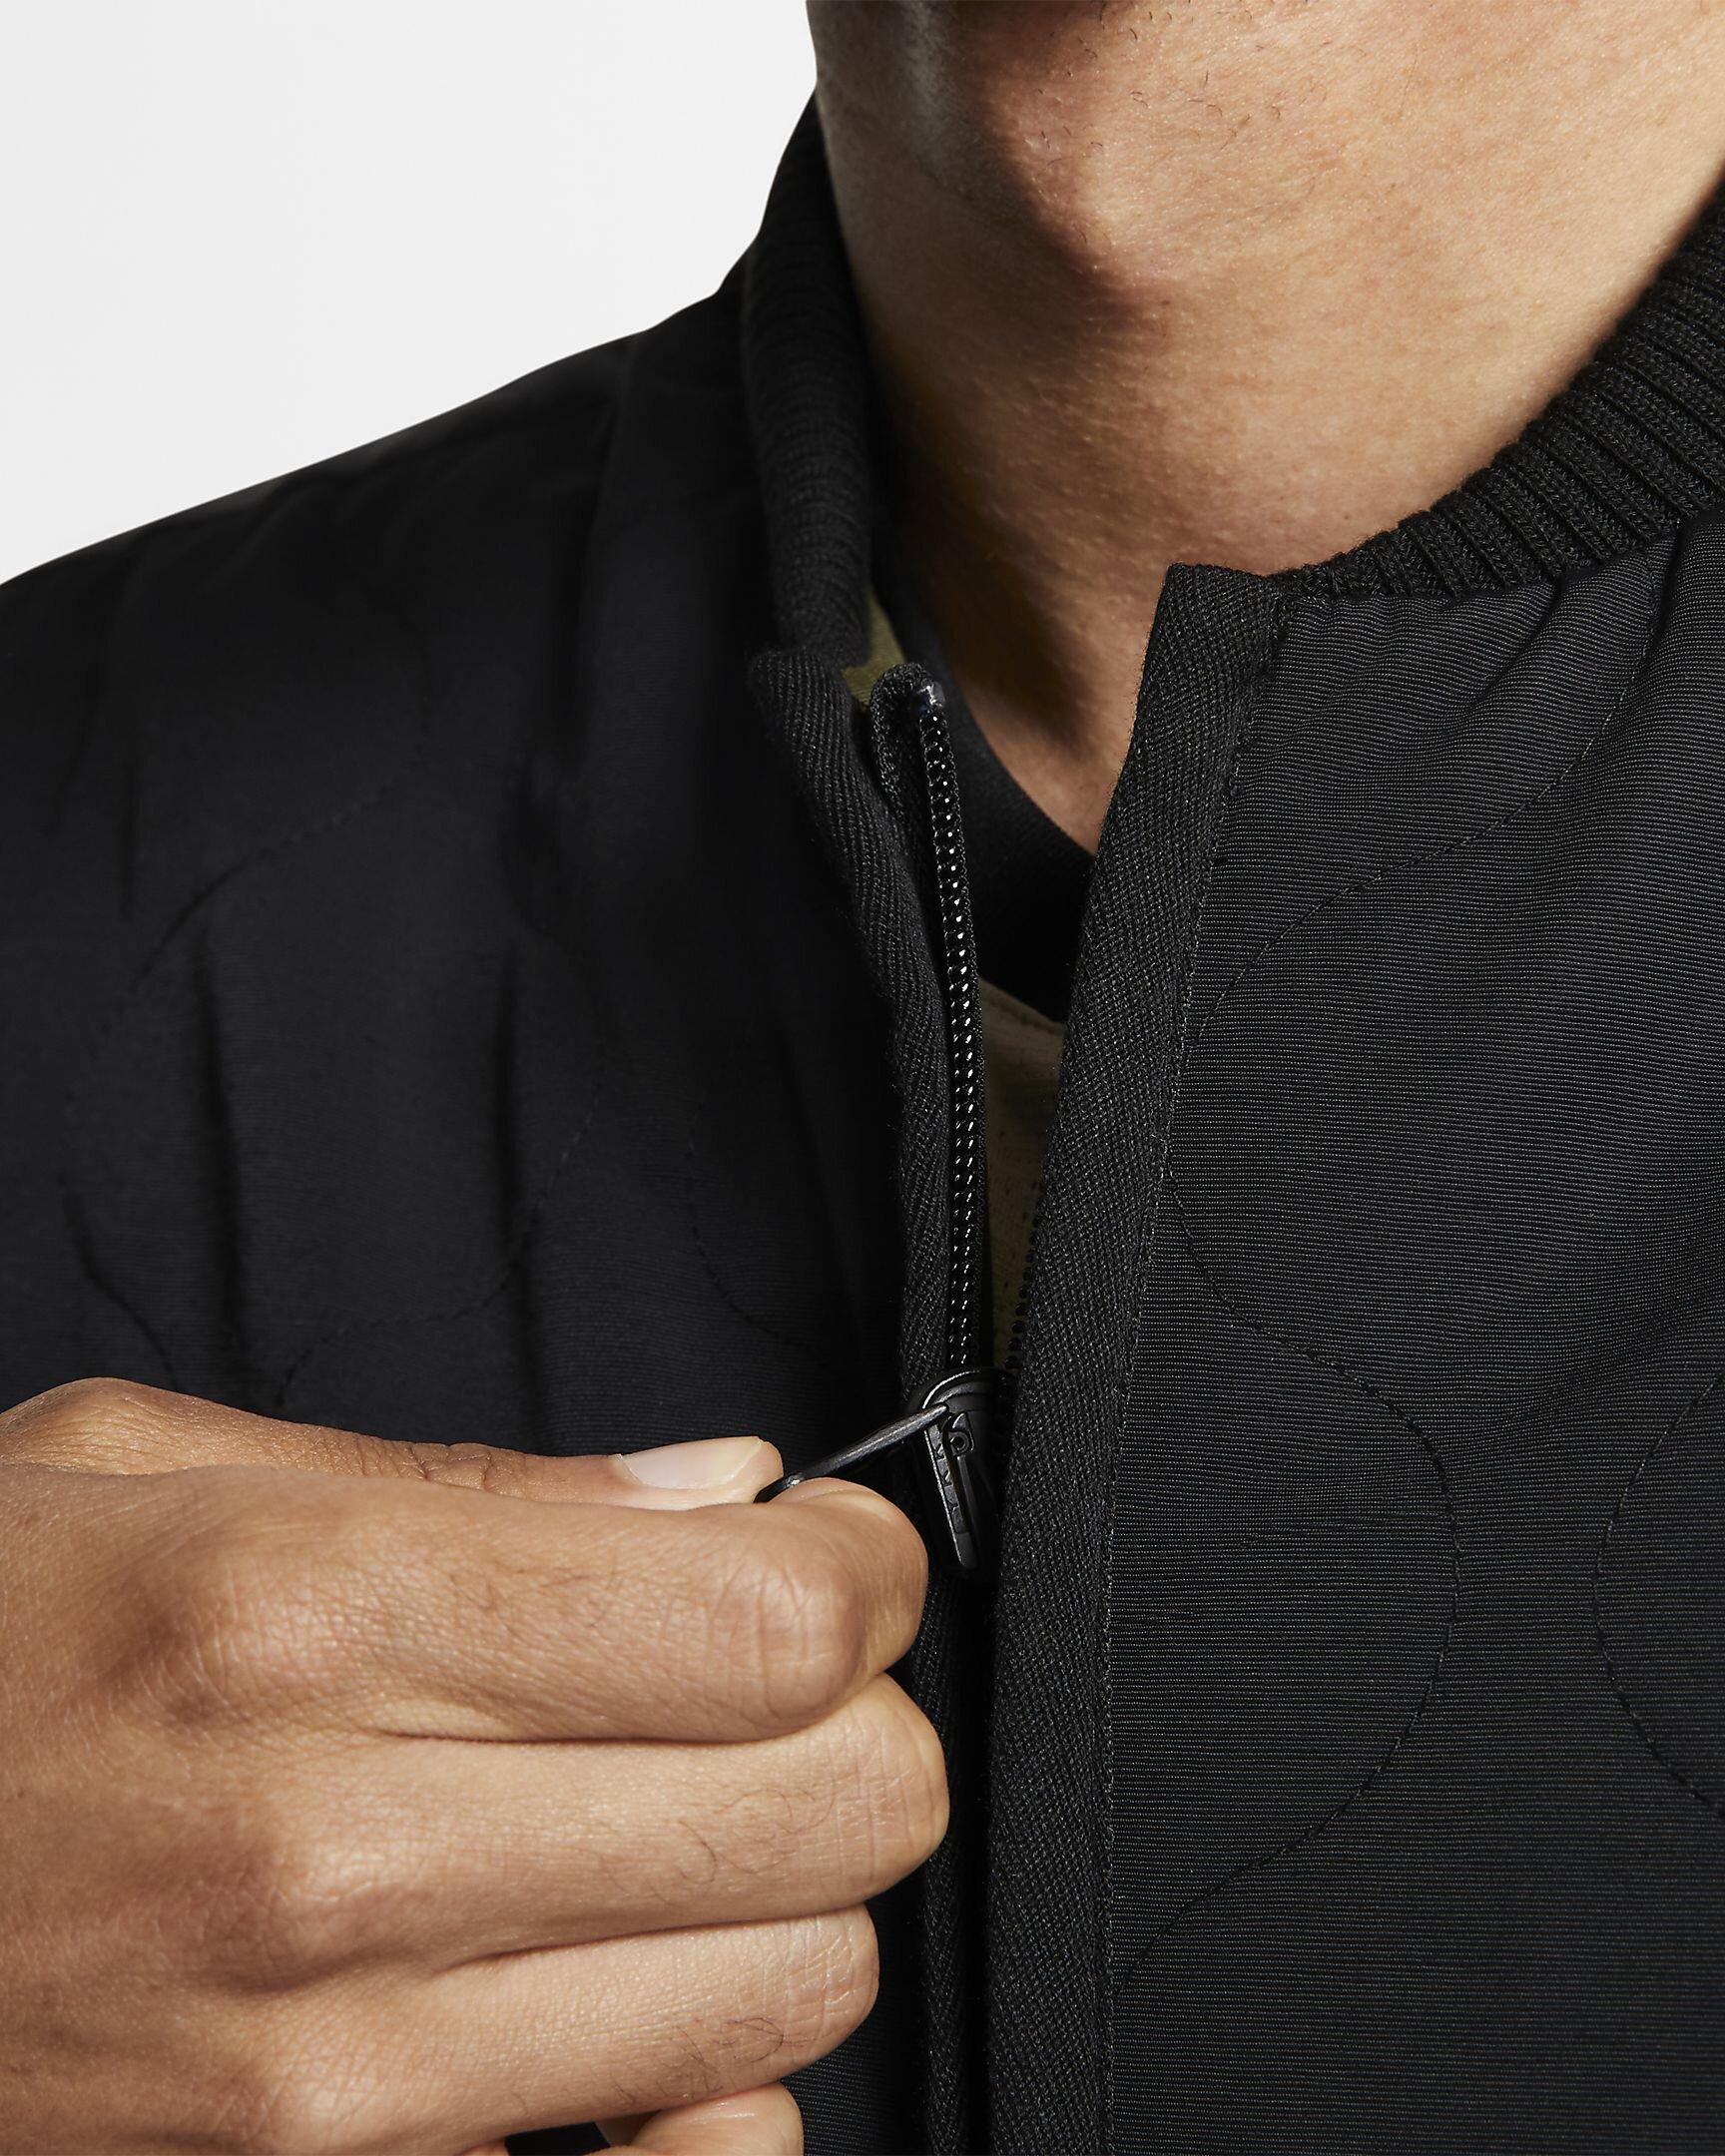 hurley-jamaica-mens-jacket-w4c3W4-4.jpg